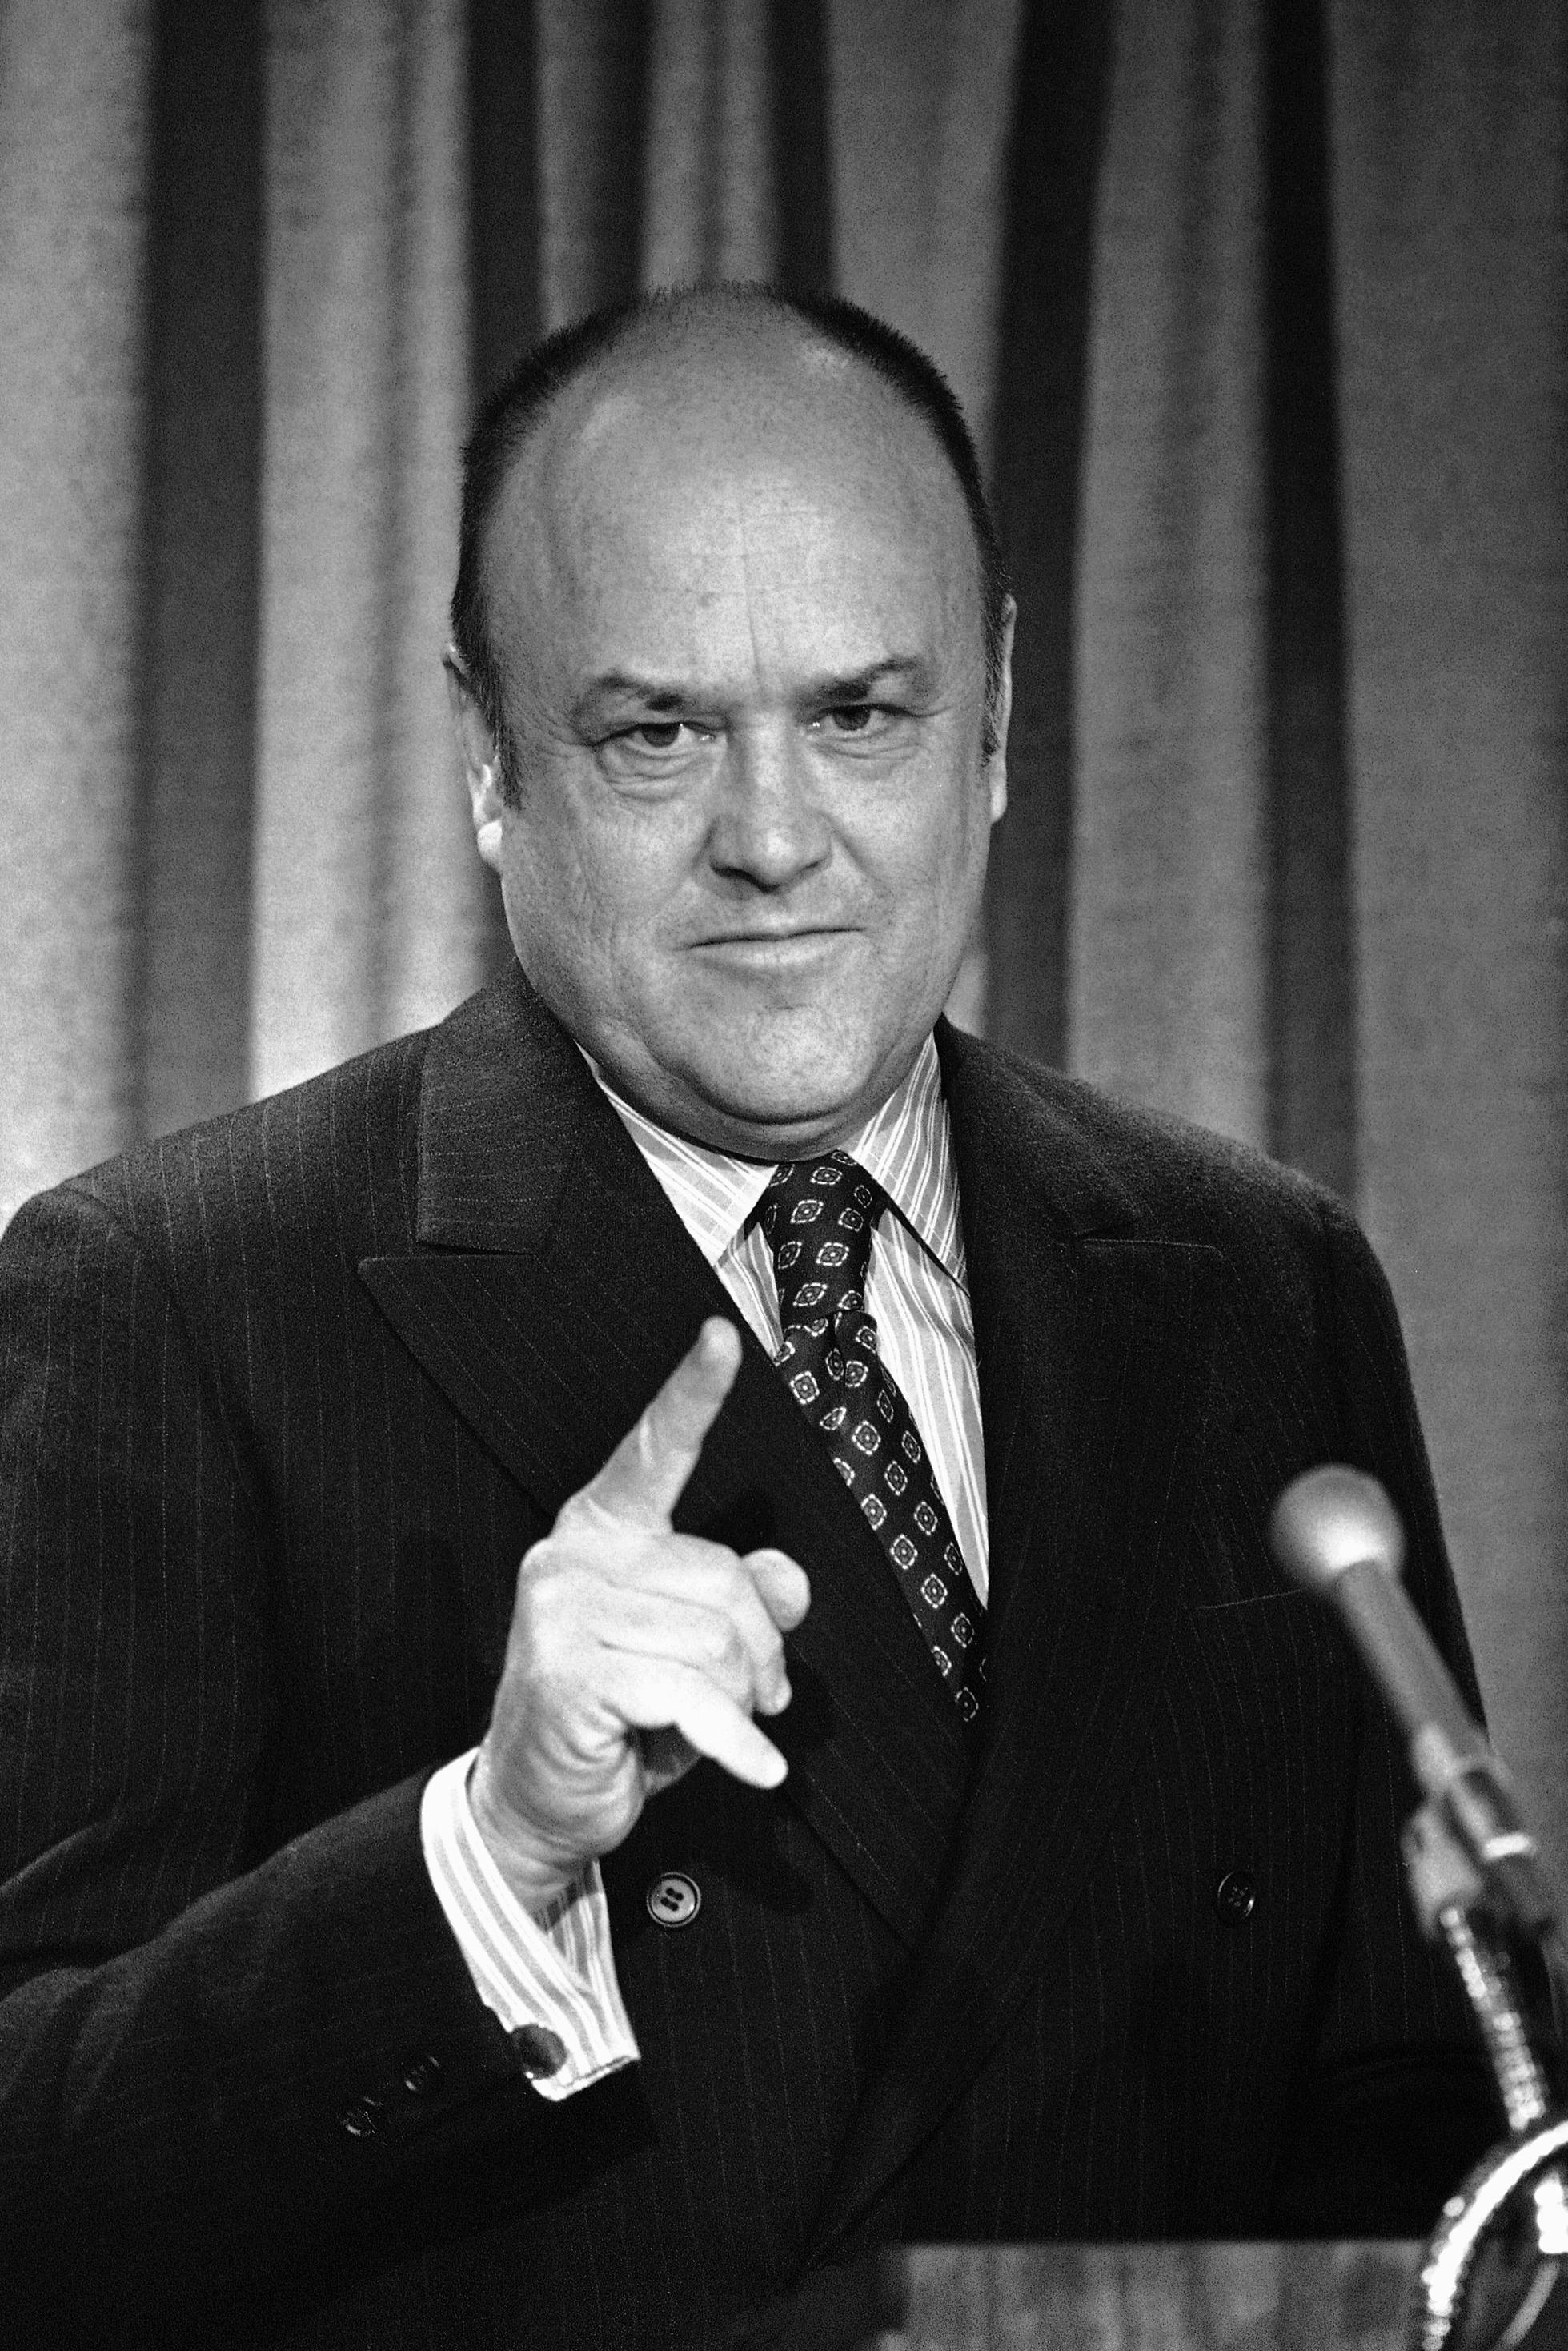 Melvin Laird, secretary of defense under President Richard Nixon.